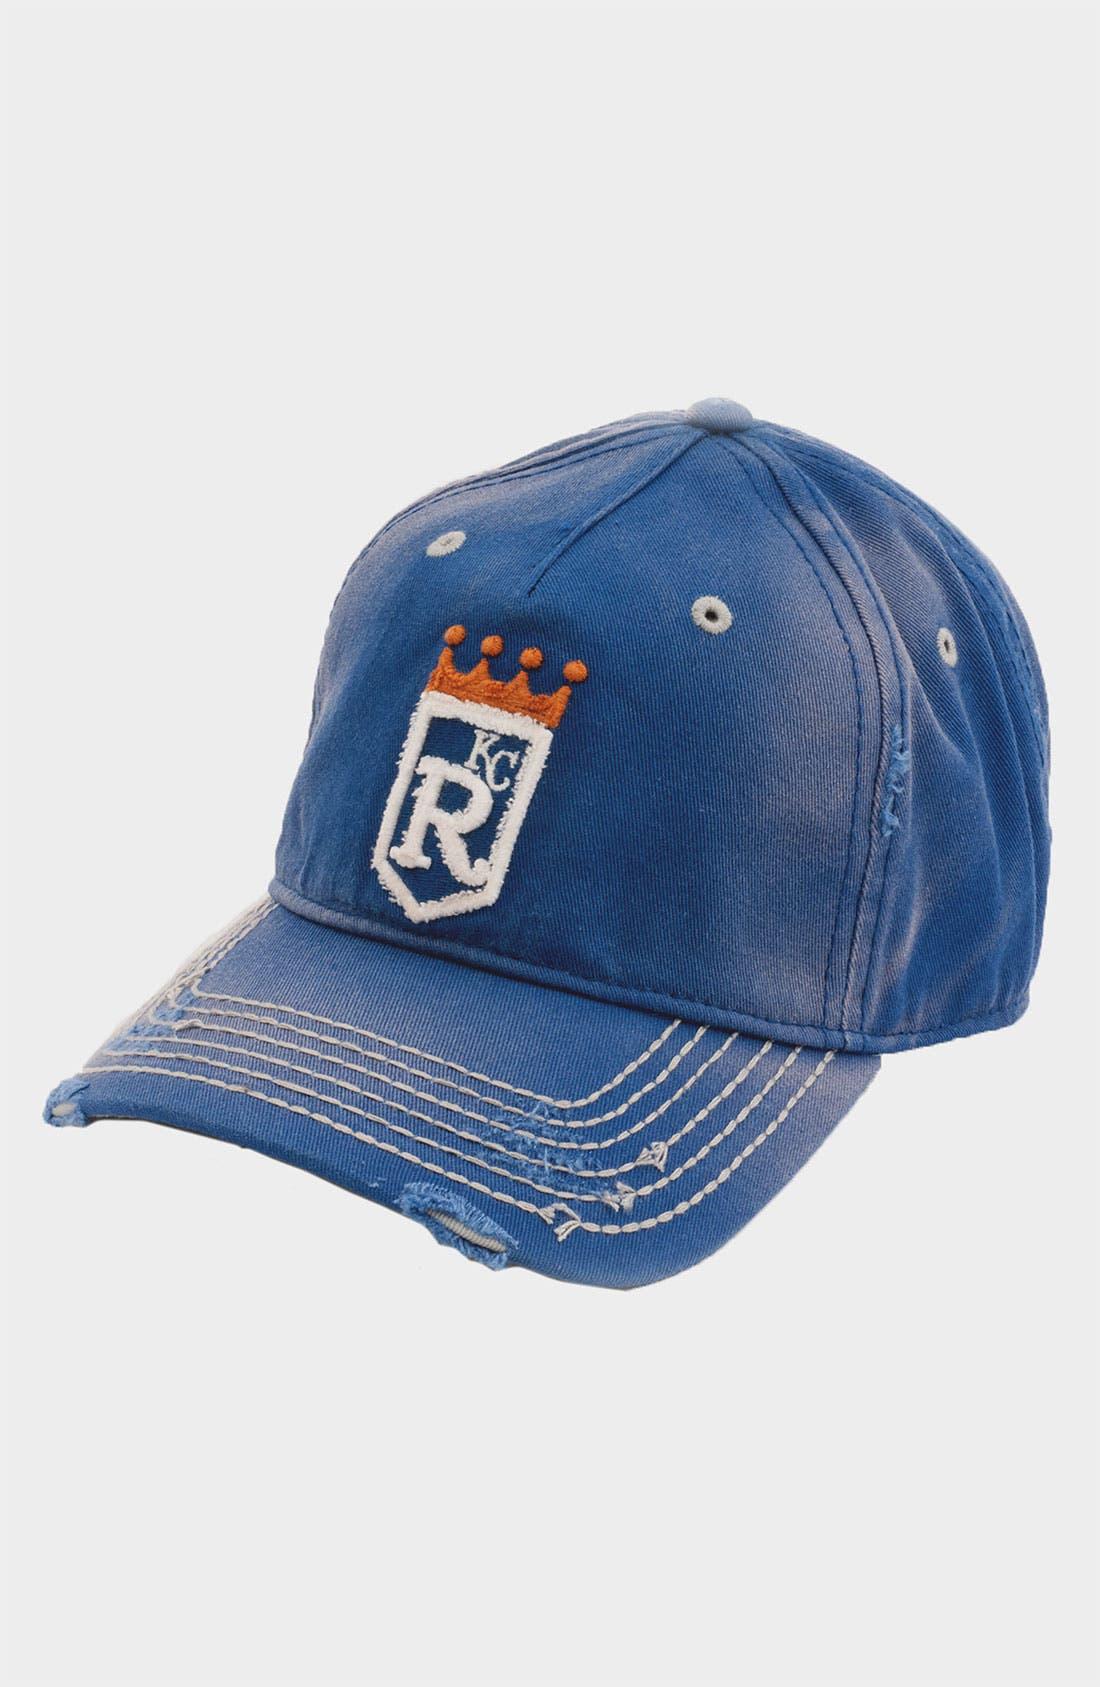 Alternate Image 1 Selected - American Needle 'Kansas City Royals' Baseball Cap